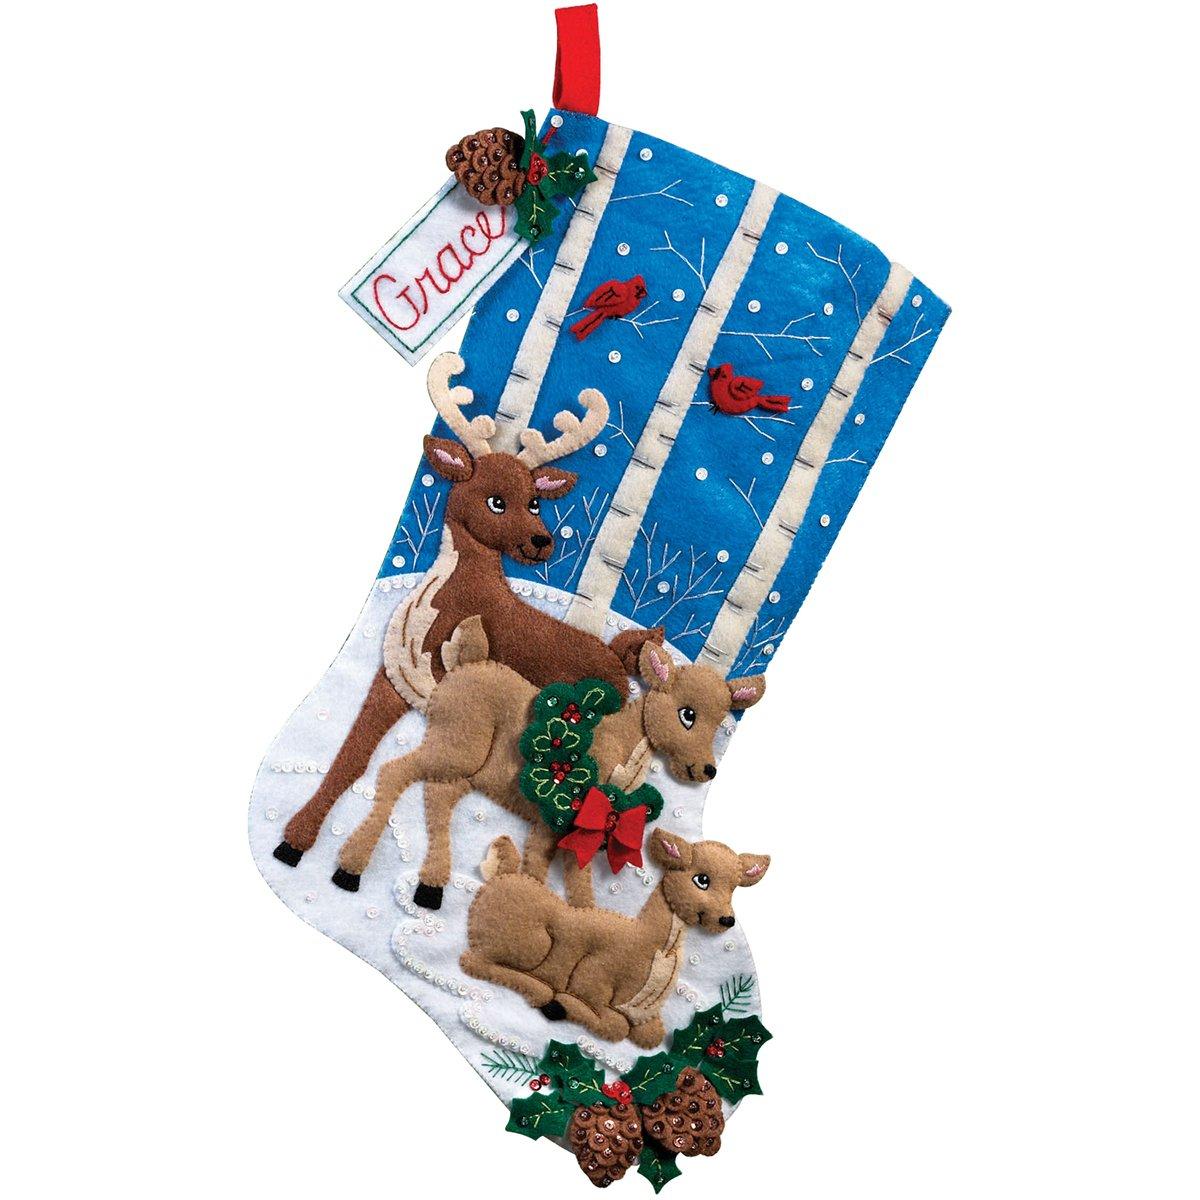 Bucilla 18-Inch Christmas Stocking Felt Applique Kit, 86502 Deer Family Plaid Inc